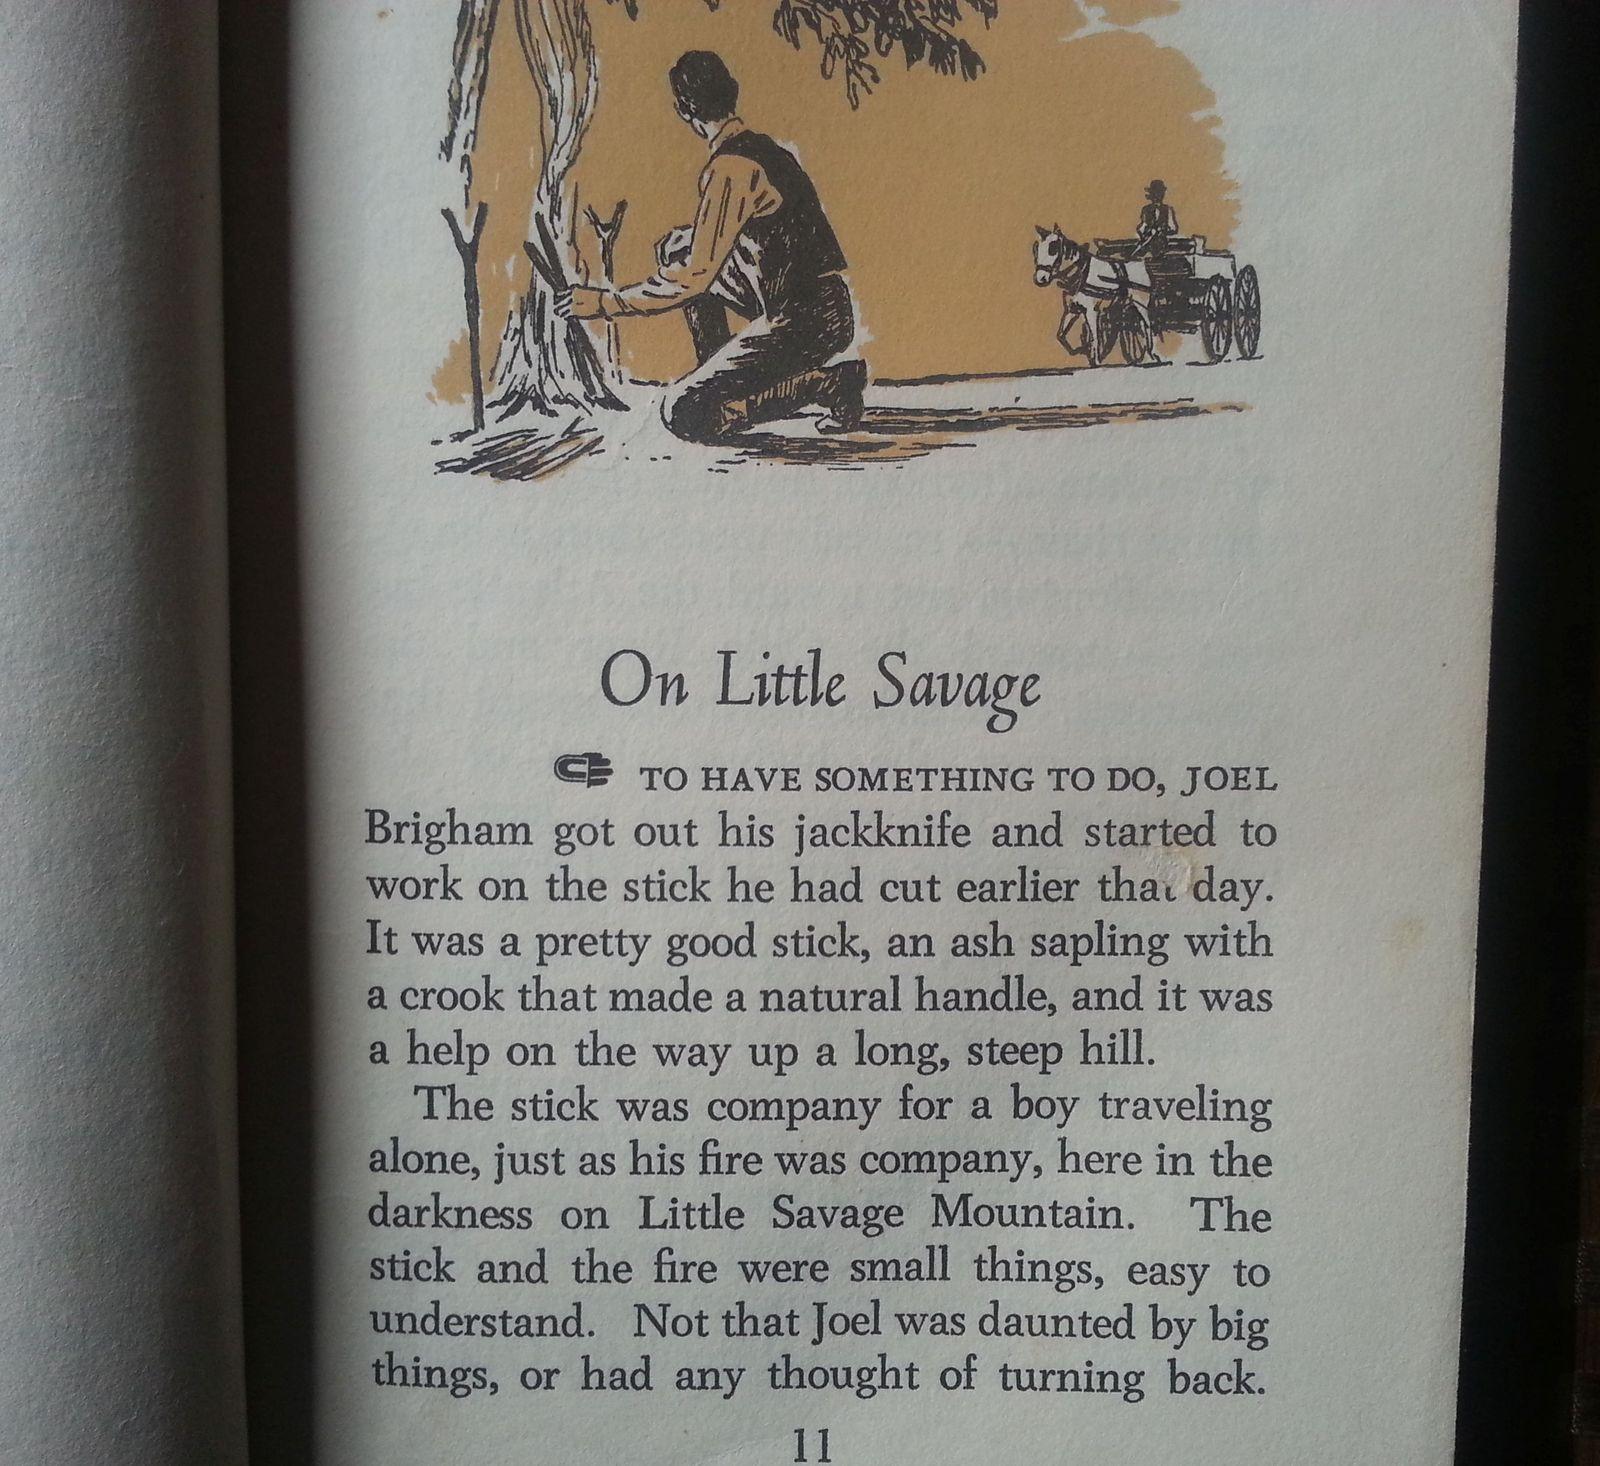 Wagon Wheels by William A. Brefogle 1956 HBDJ National Rd